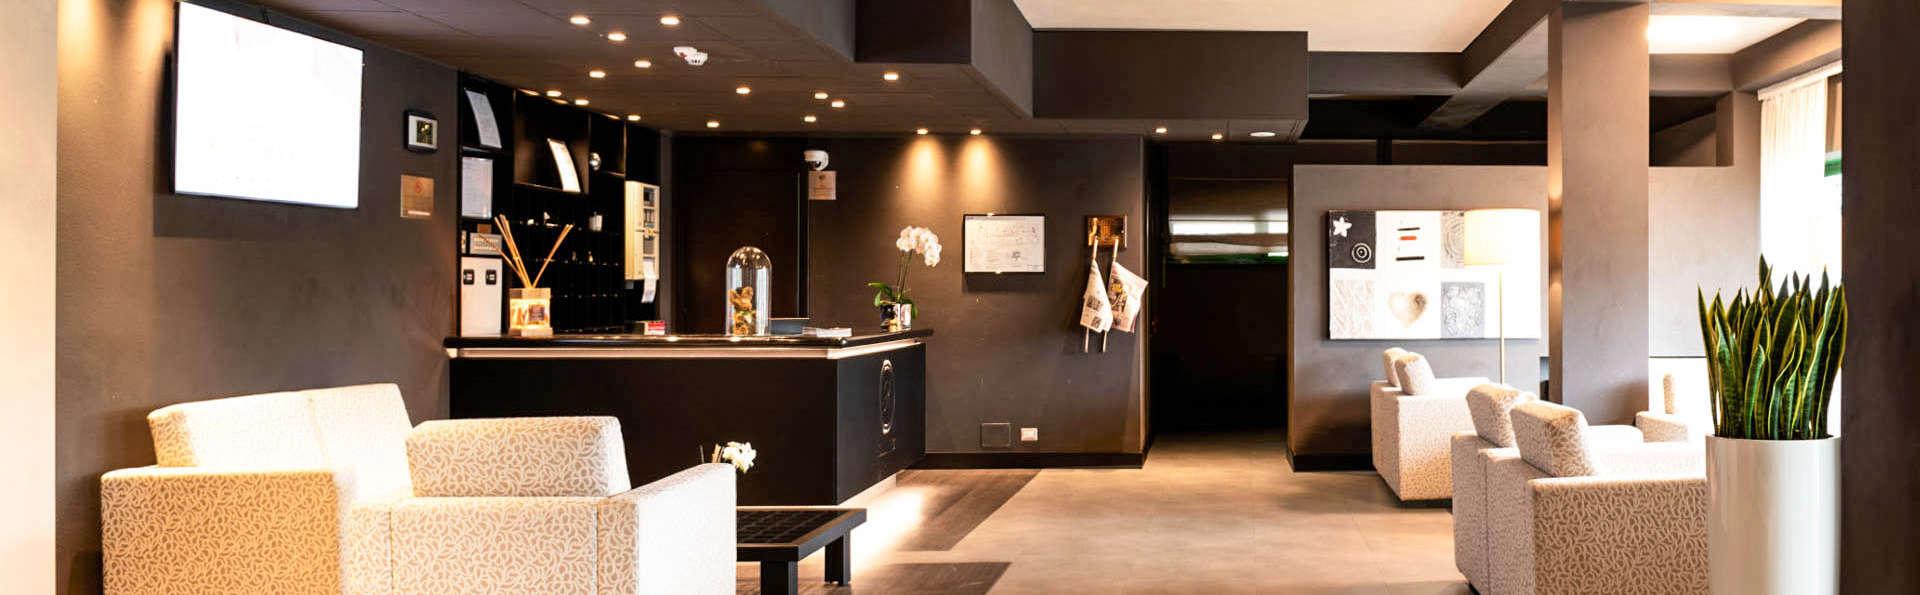 Hotel King - EDIT_LOBBY_01.jpg